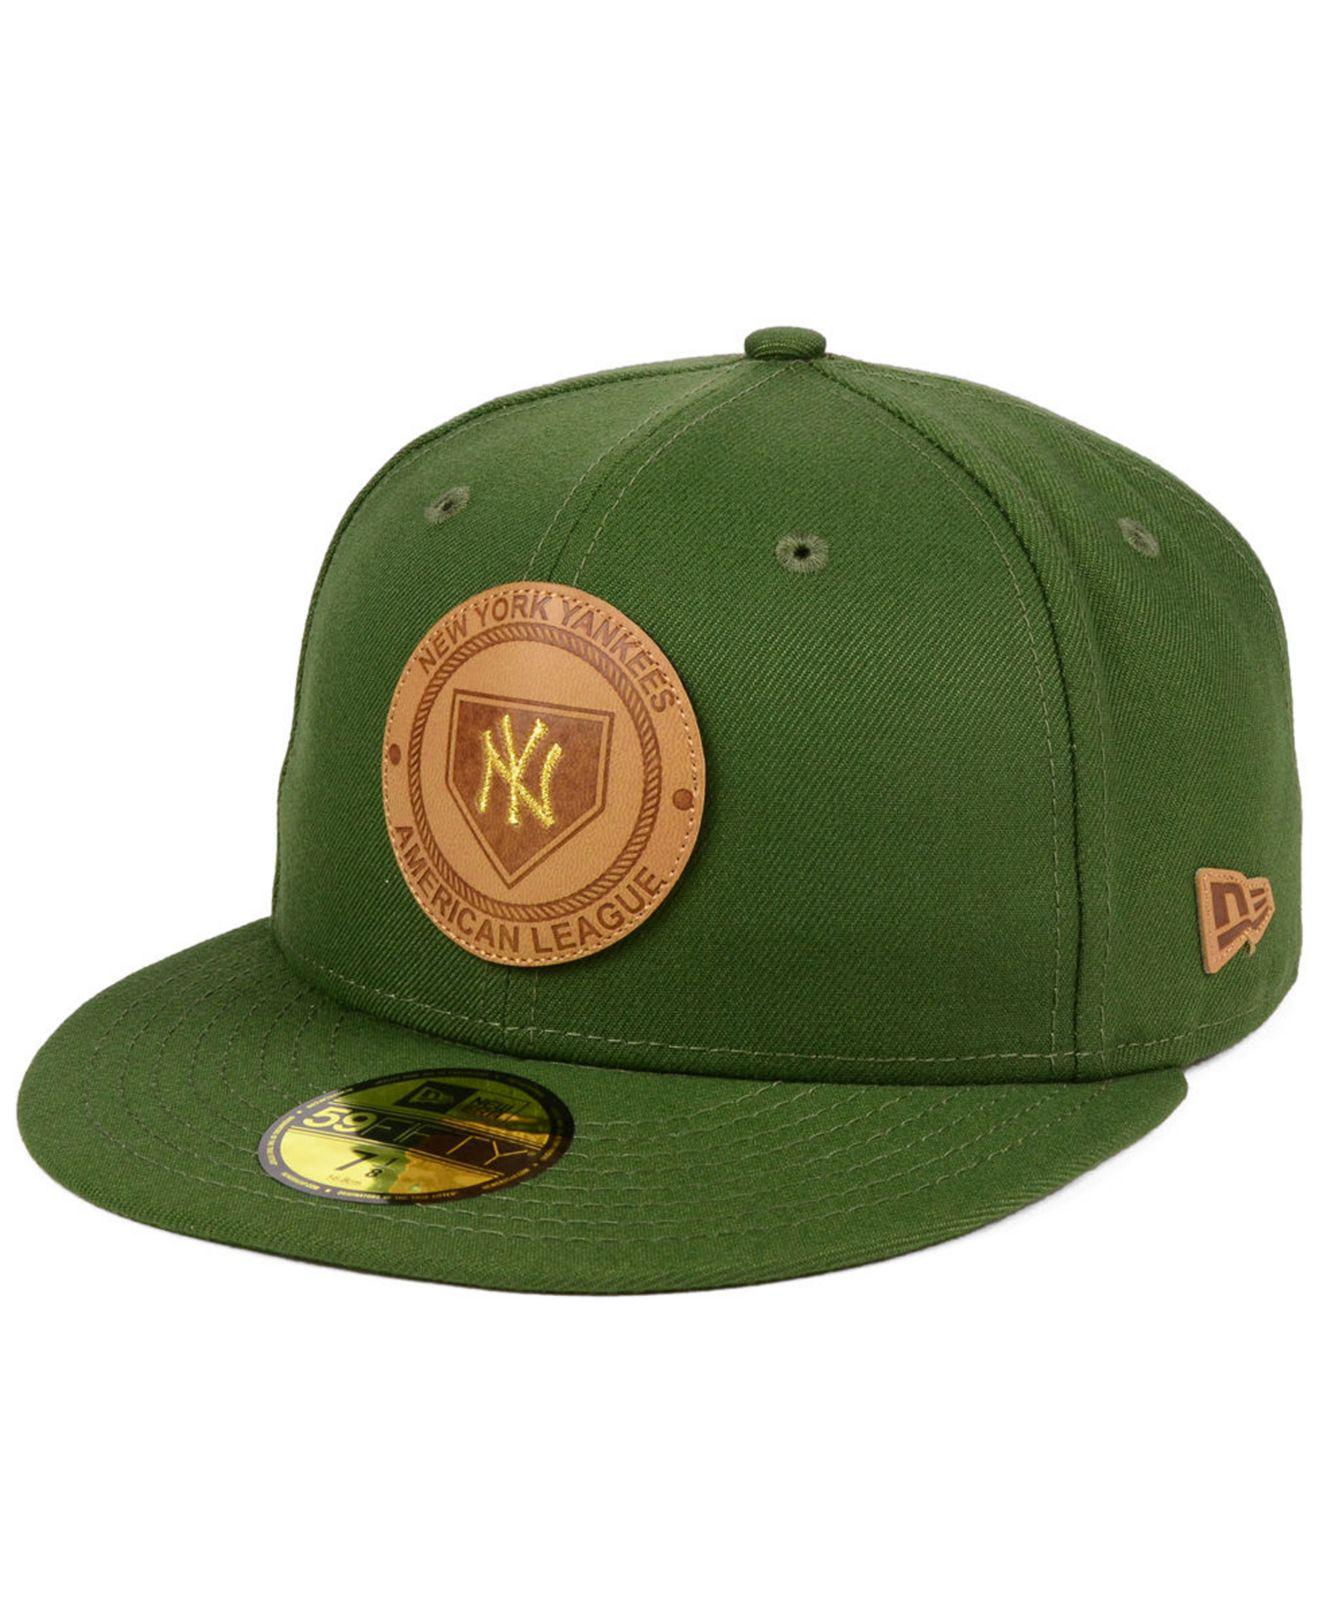 buy online cced9 b7cd8 Lyst - KTZ Vintage Olive 59fifty Cap in Green for Men